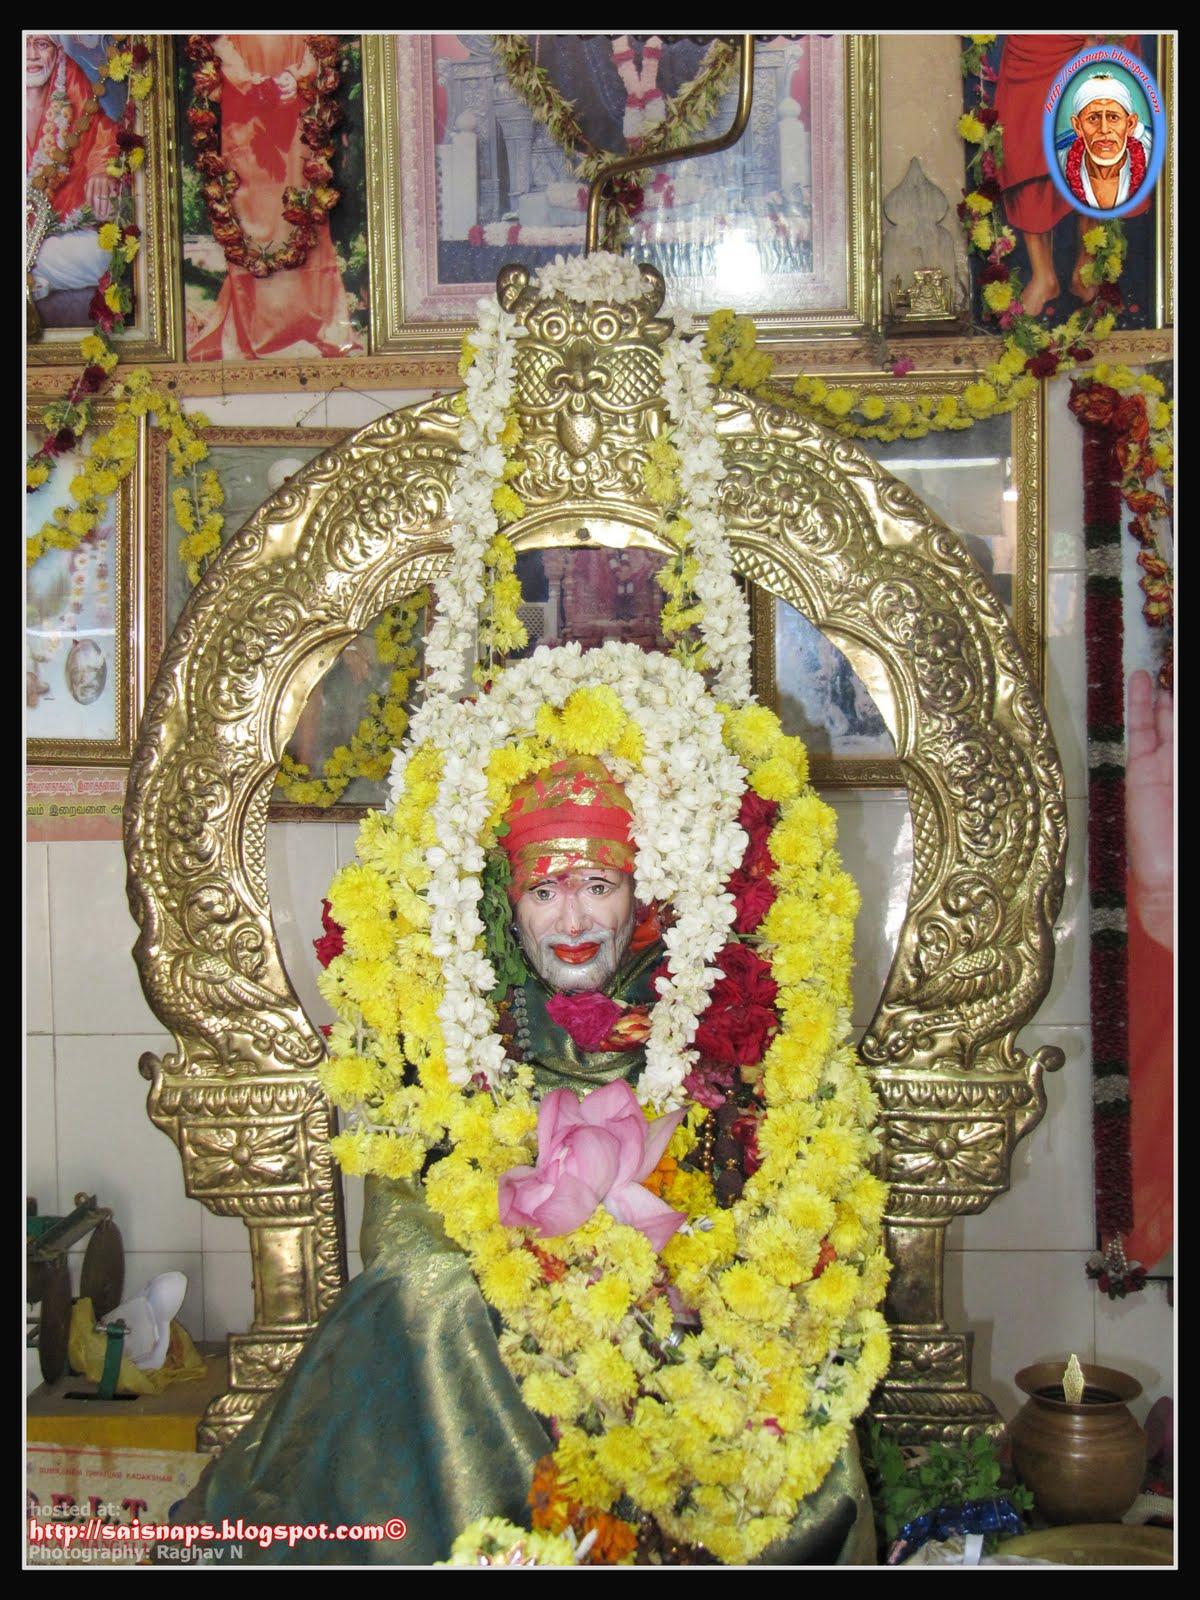 Sai Wallpaper: Sri Shirdi Sai Baba Temple, South Sivan